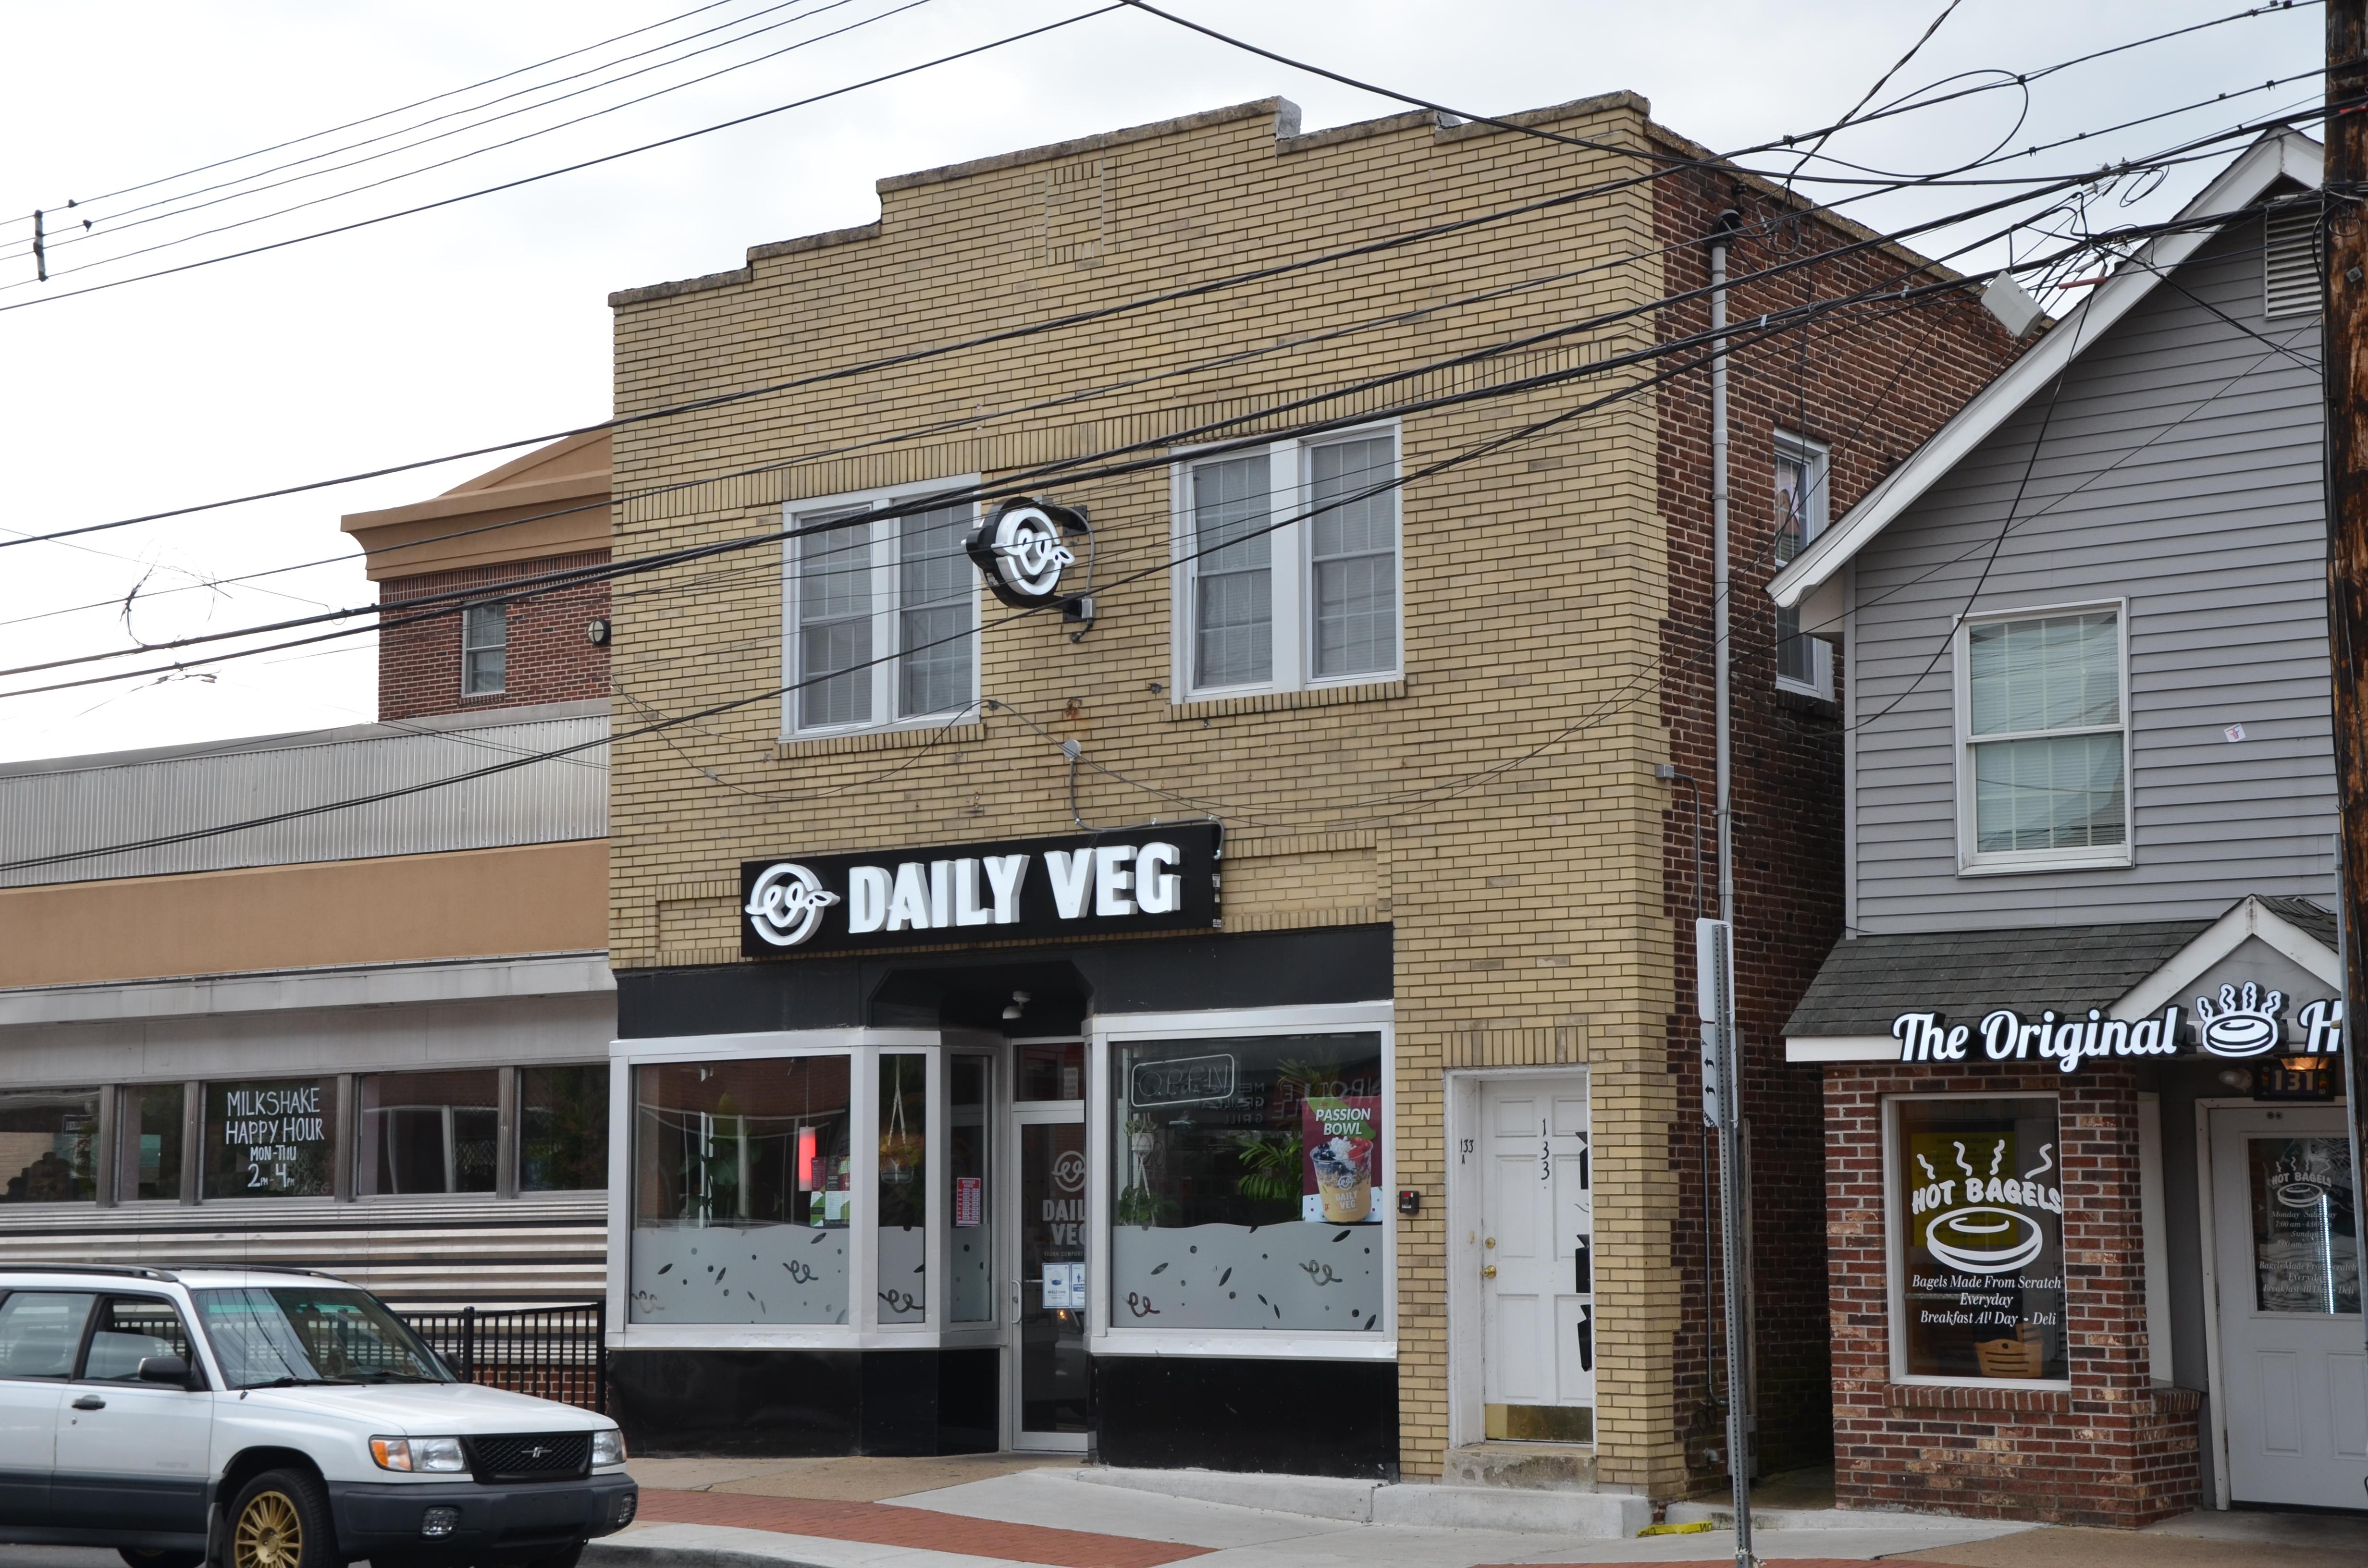 Two vegan establishments open on Main Street